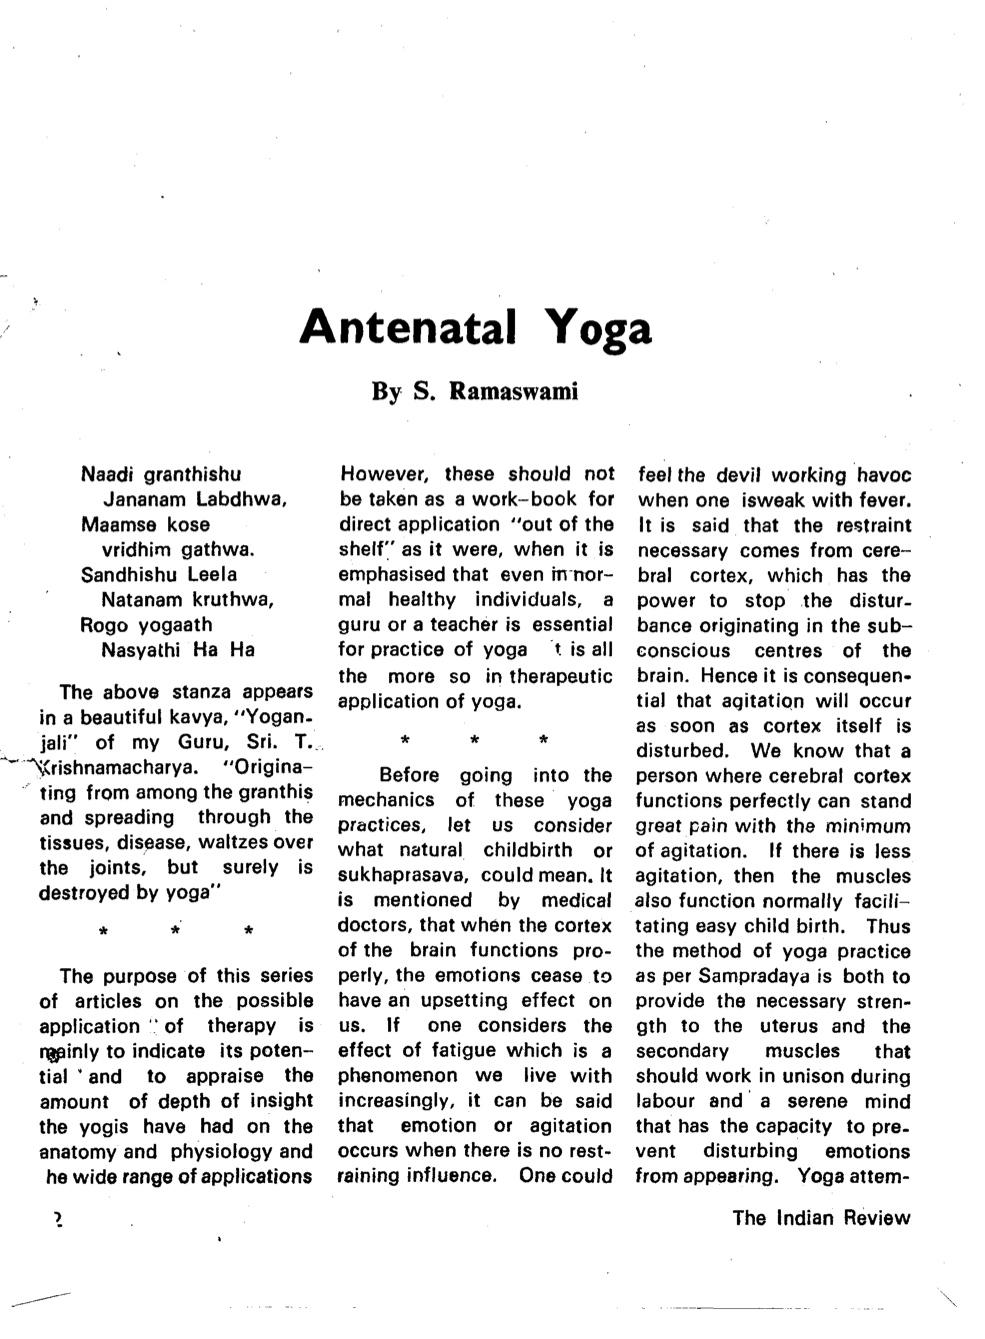 Ashtanga Vinyasa Krama Yoga and Beyond   at home : October 2014